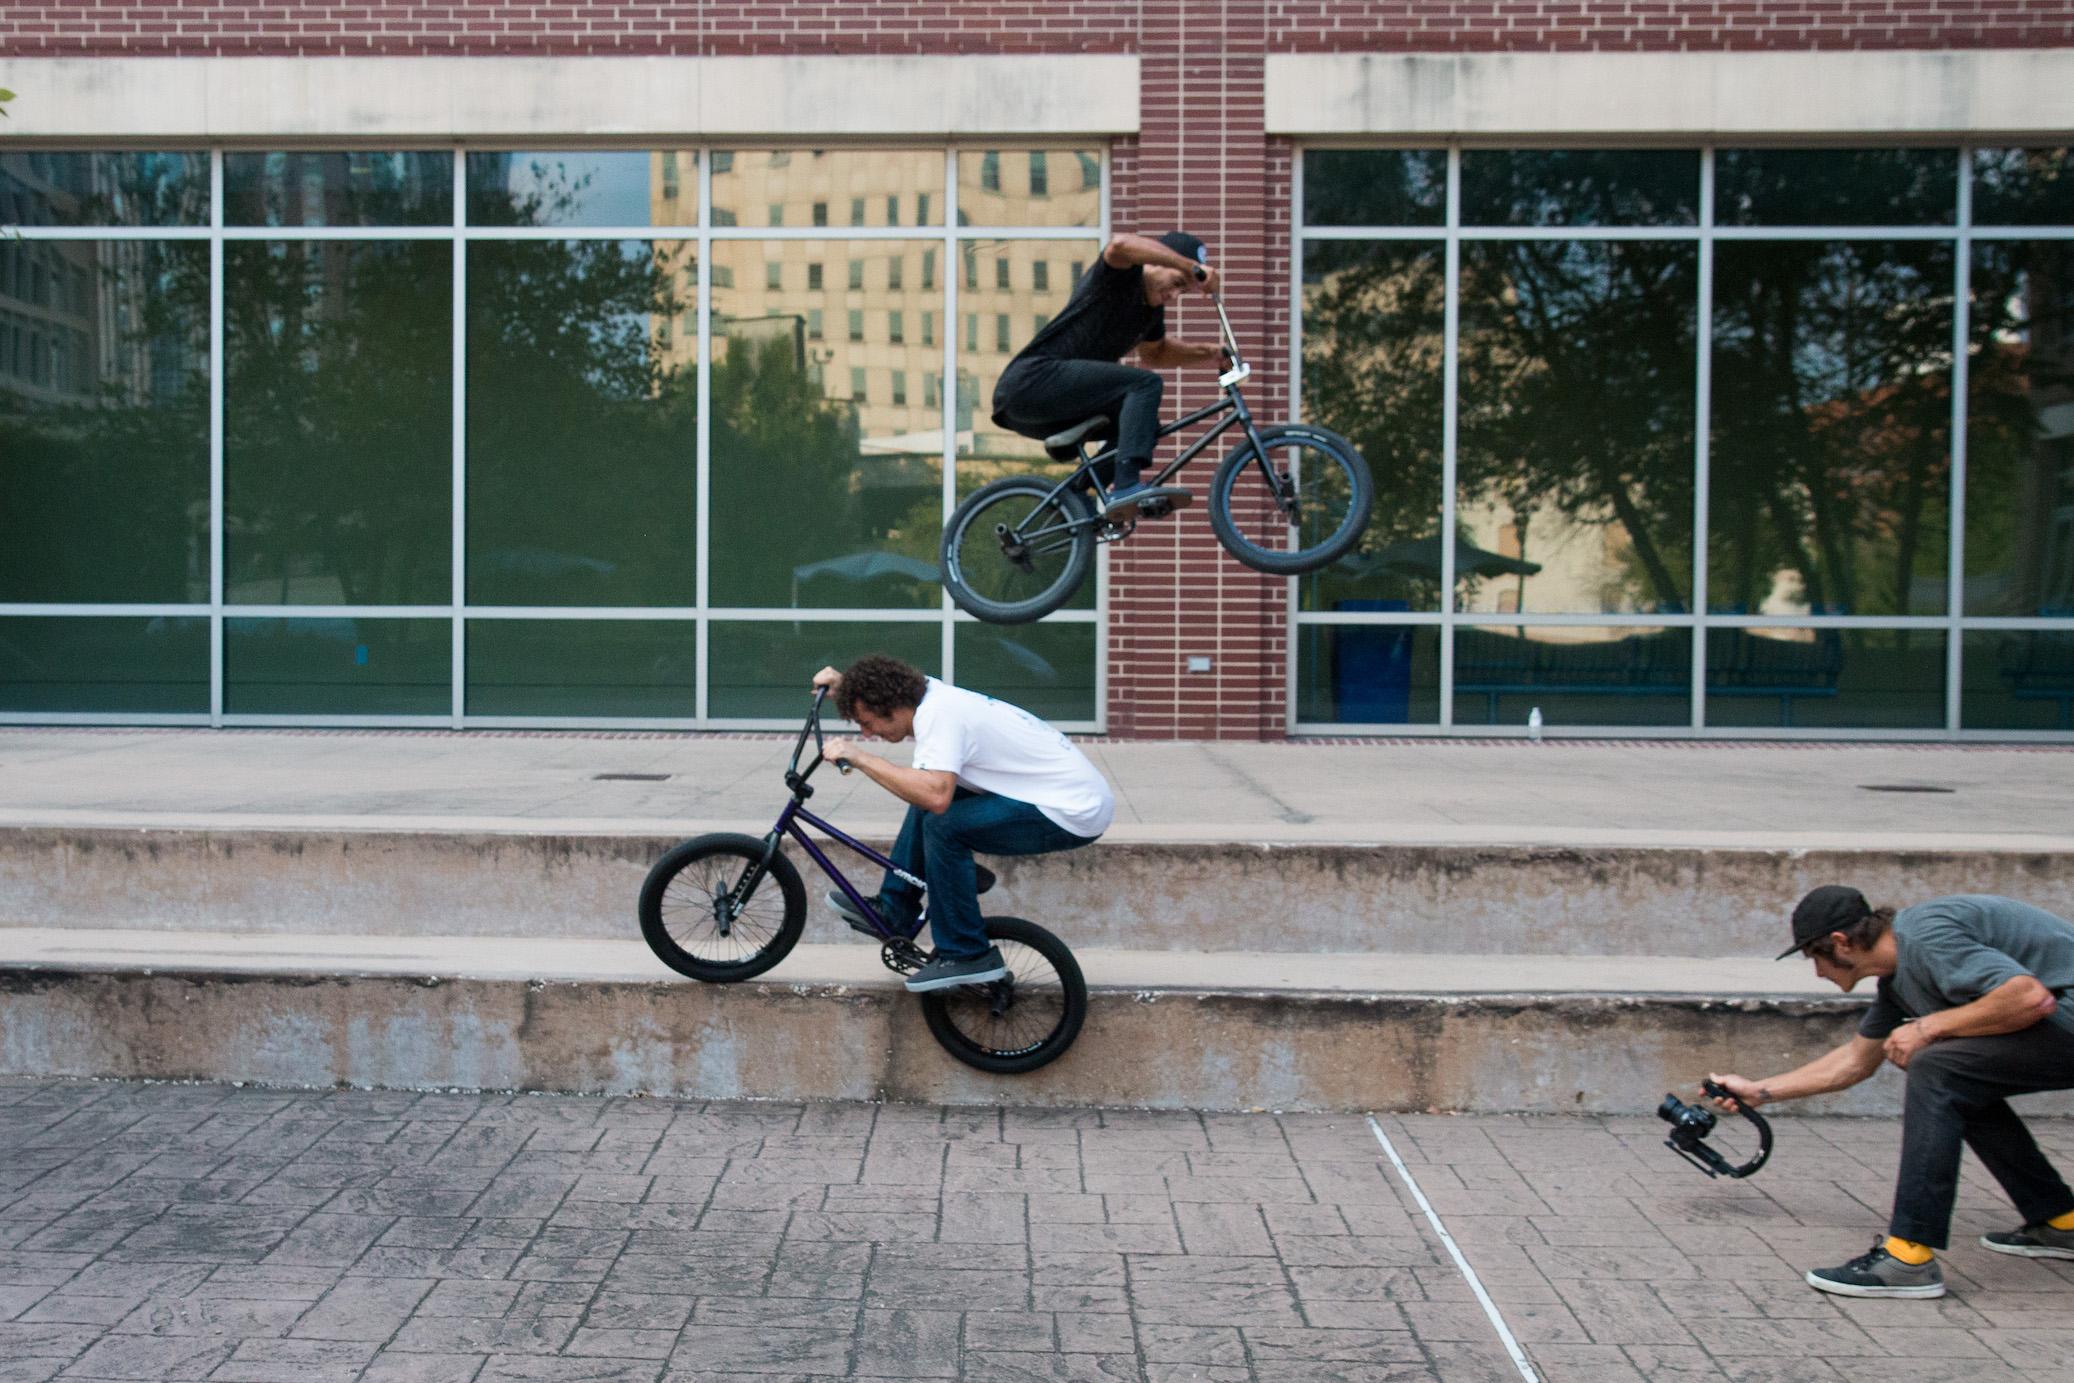 20170910 sunday street ride Chad McClain_half res_5.jpg